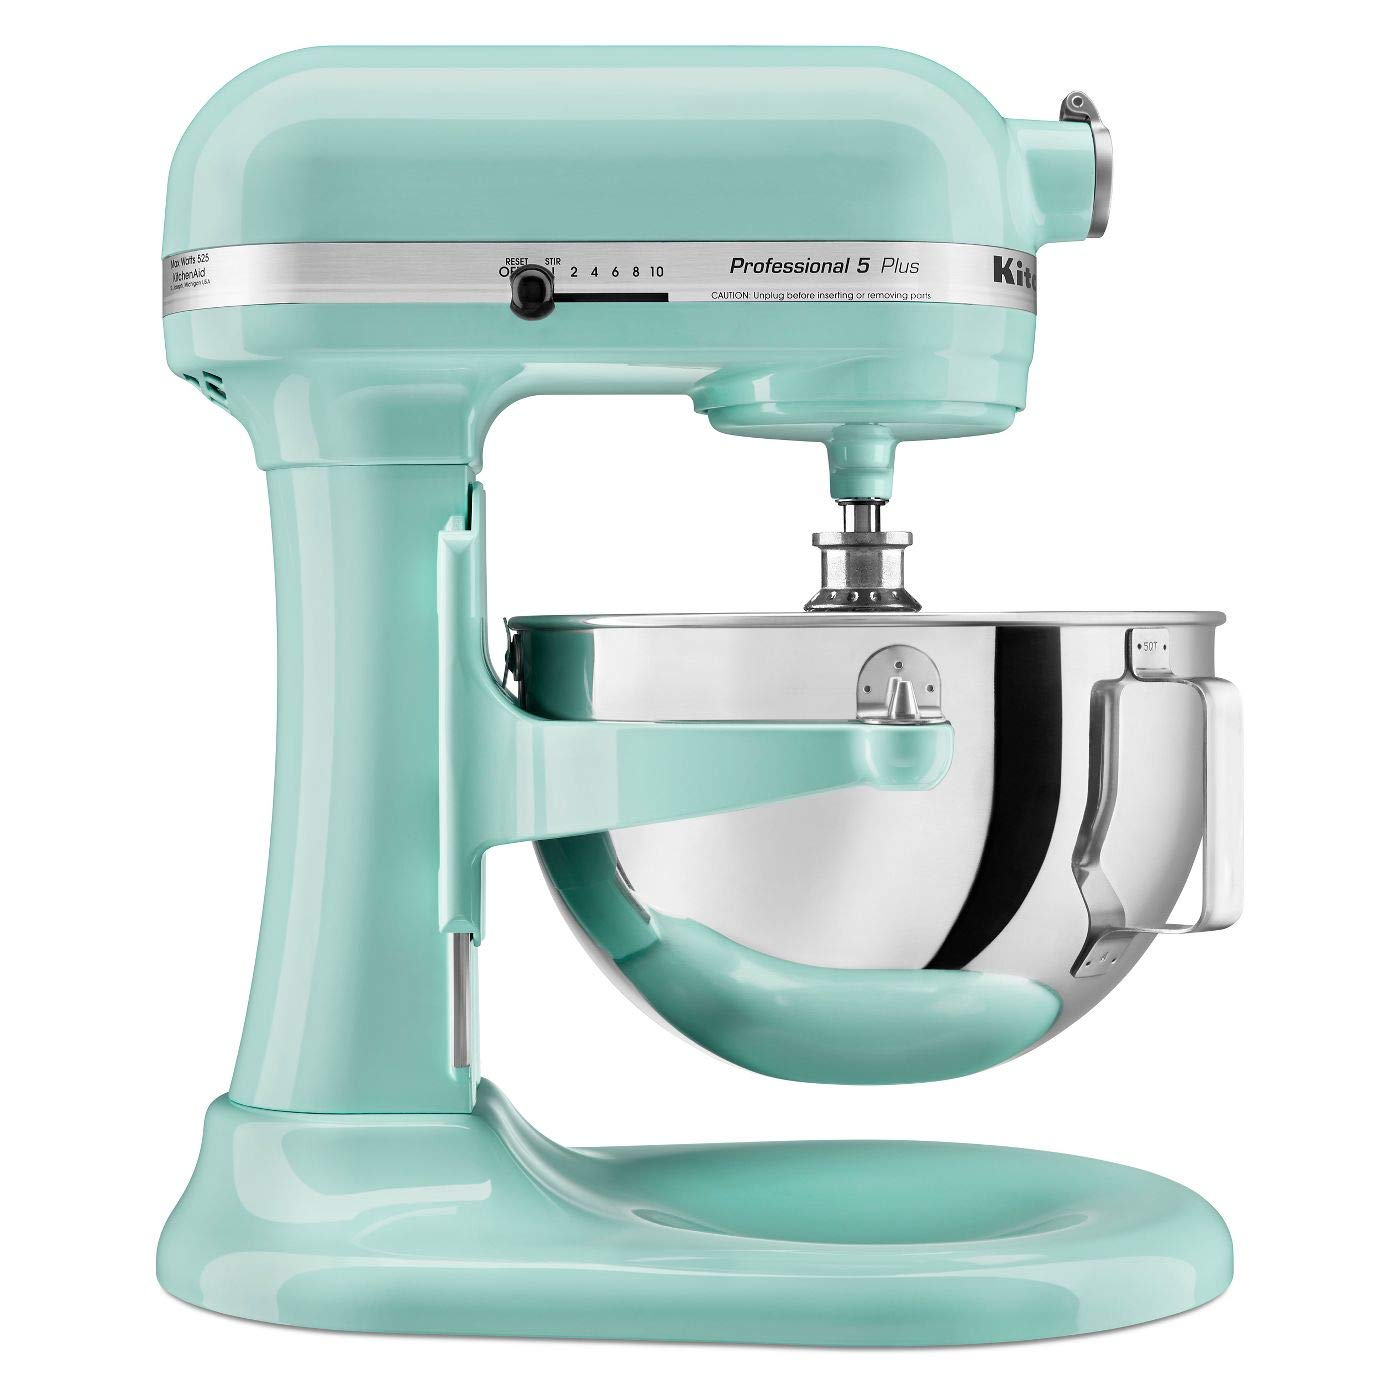 Kitchenaid Professional 5 Plus Series Stand Mixers Aqua Sky